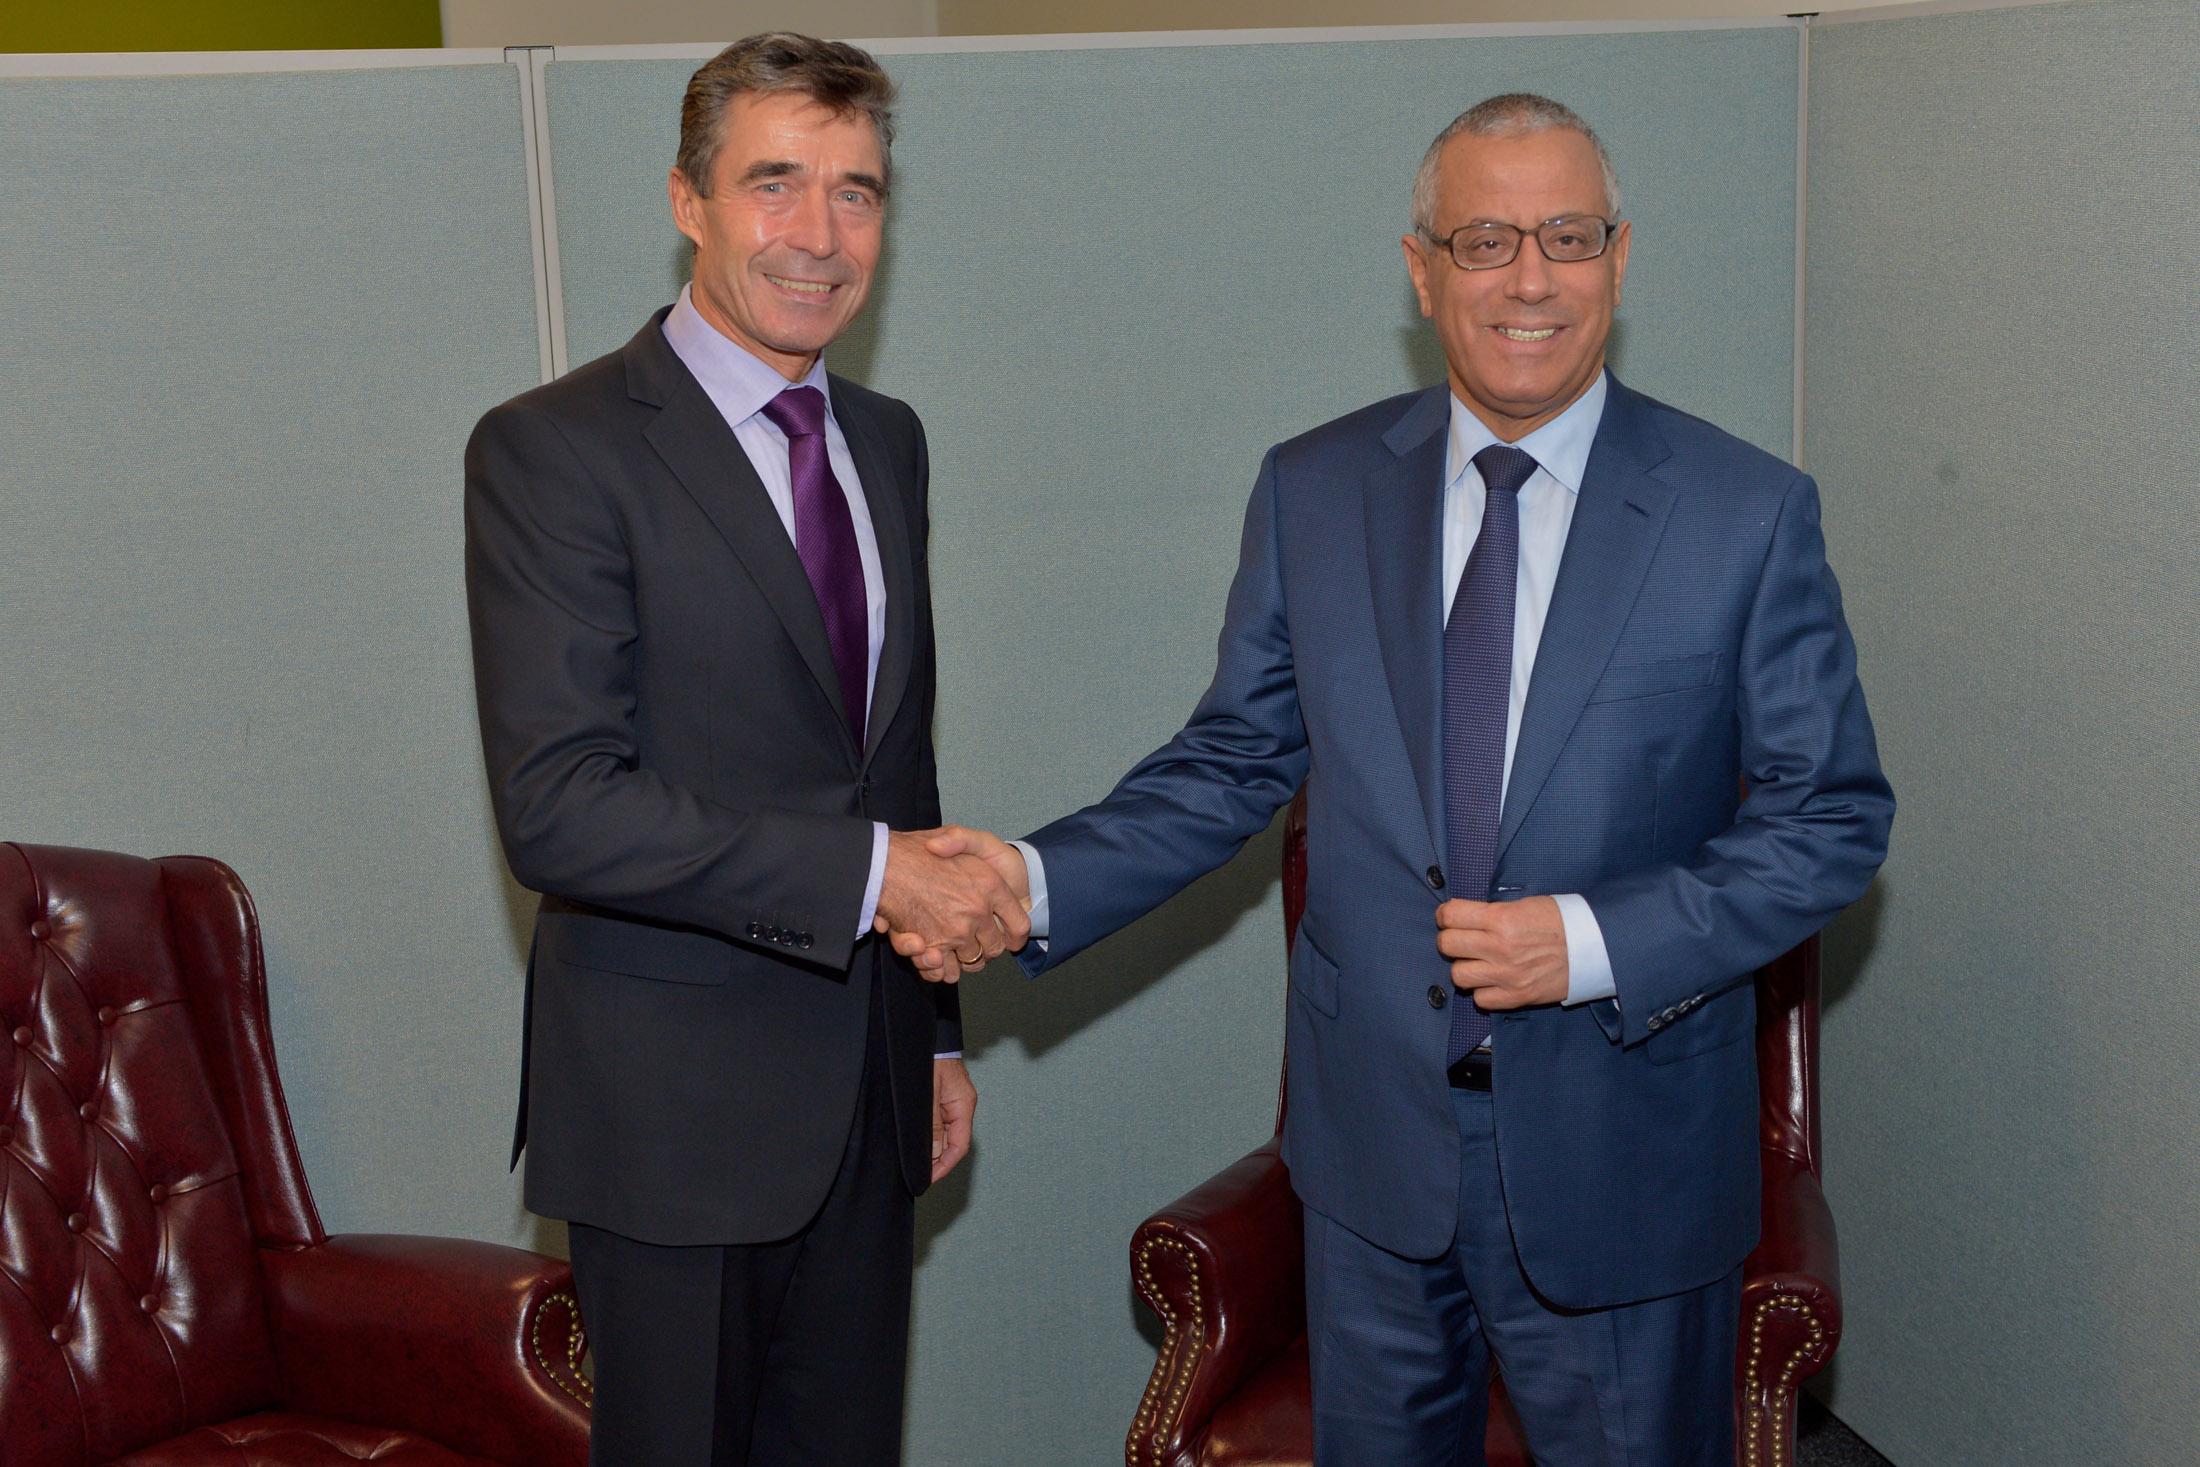 NATO Secretary General Anders Fogh Rasmussen and the Prime Minister of Libya, Ali Zeidan